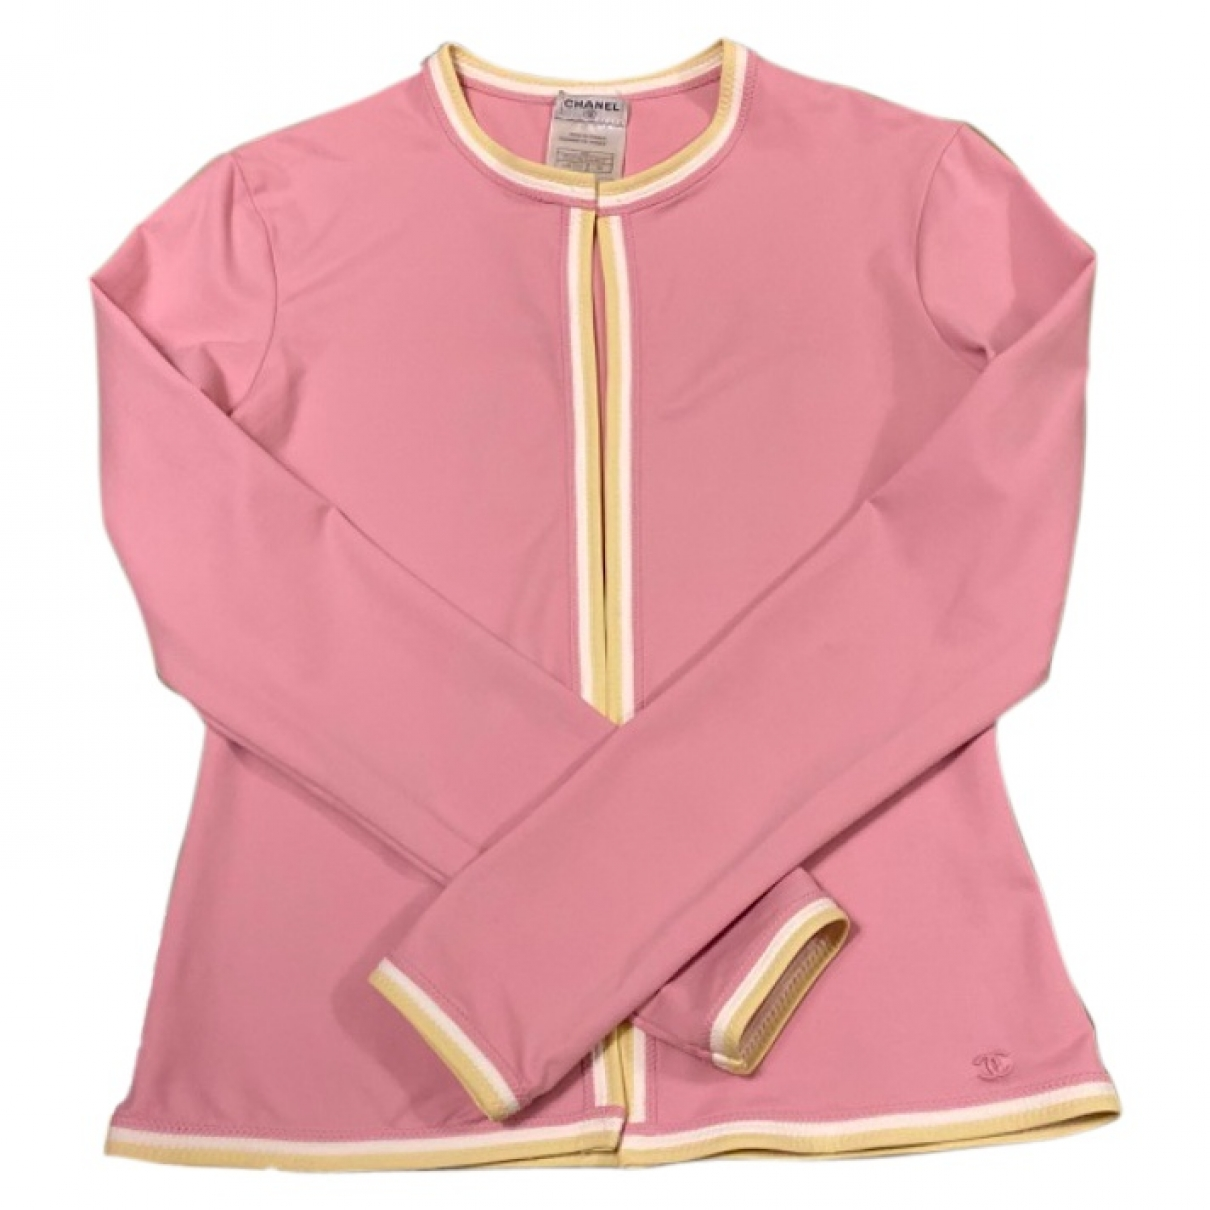 Chanel \N Pink jacket for Women 38 FR